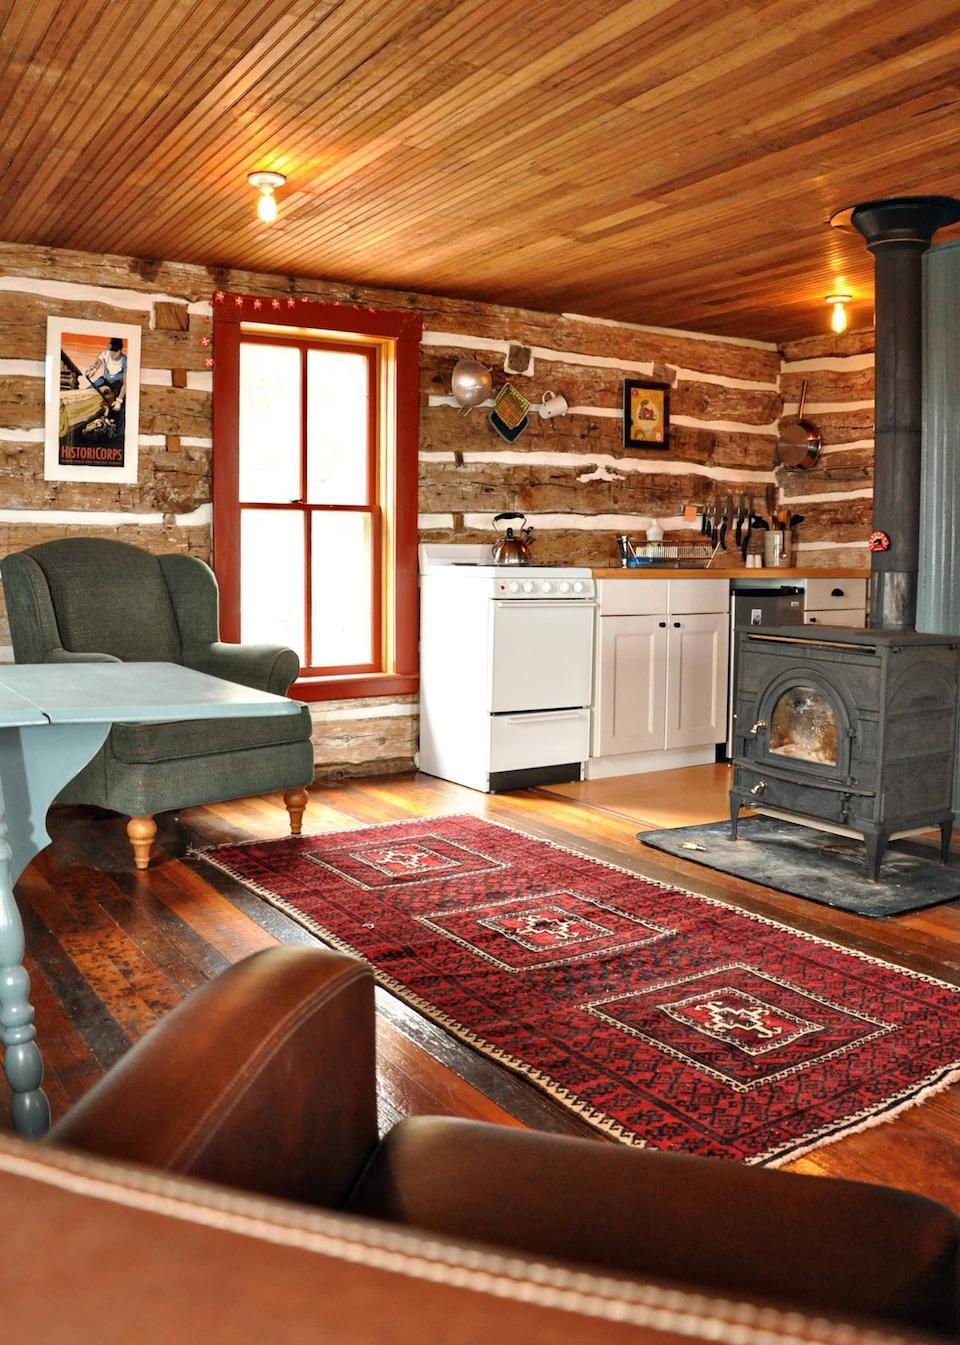 trout-river-log-cabin-2